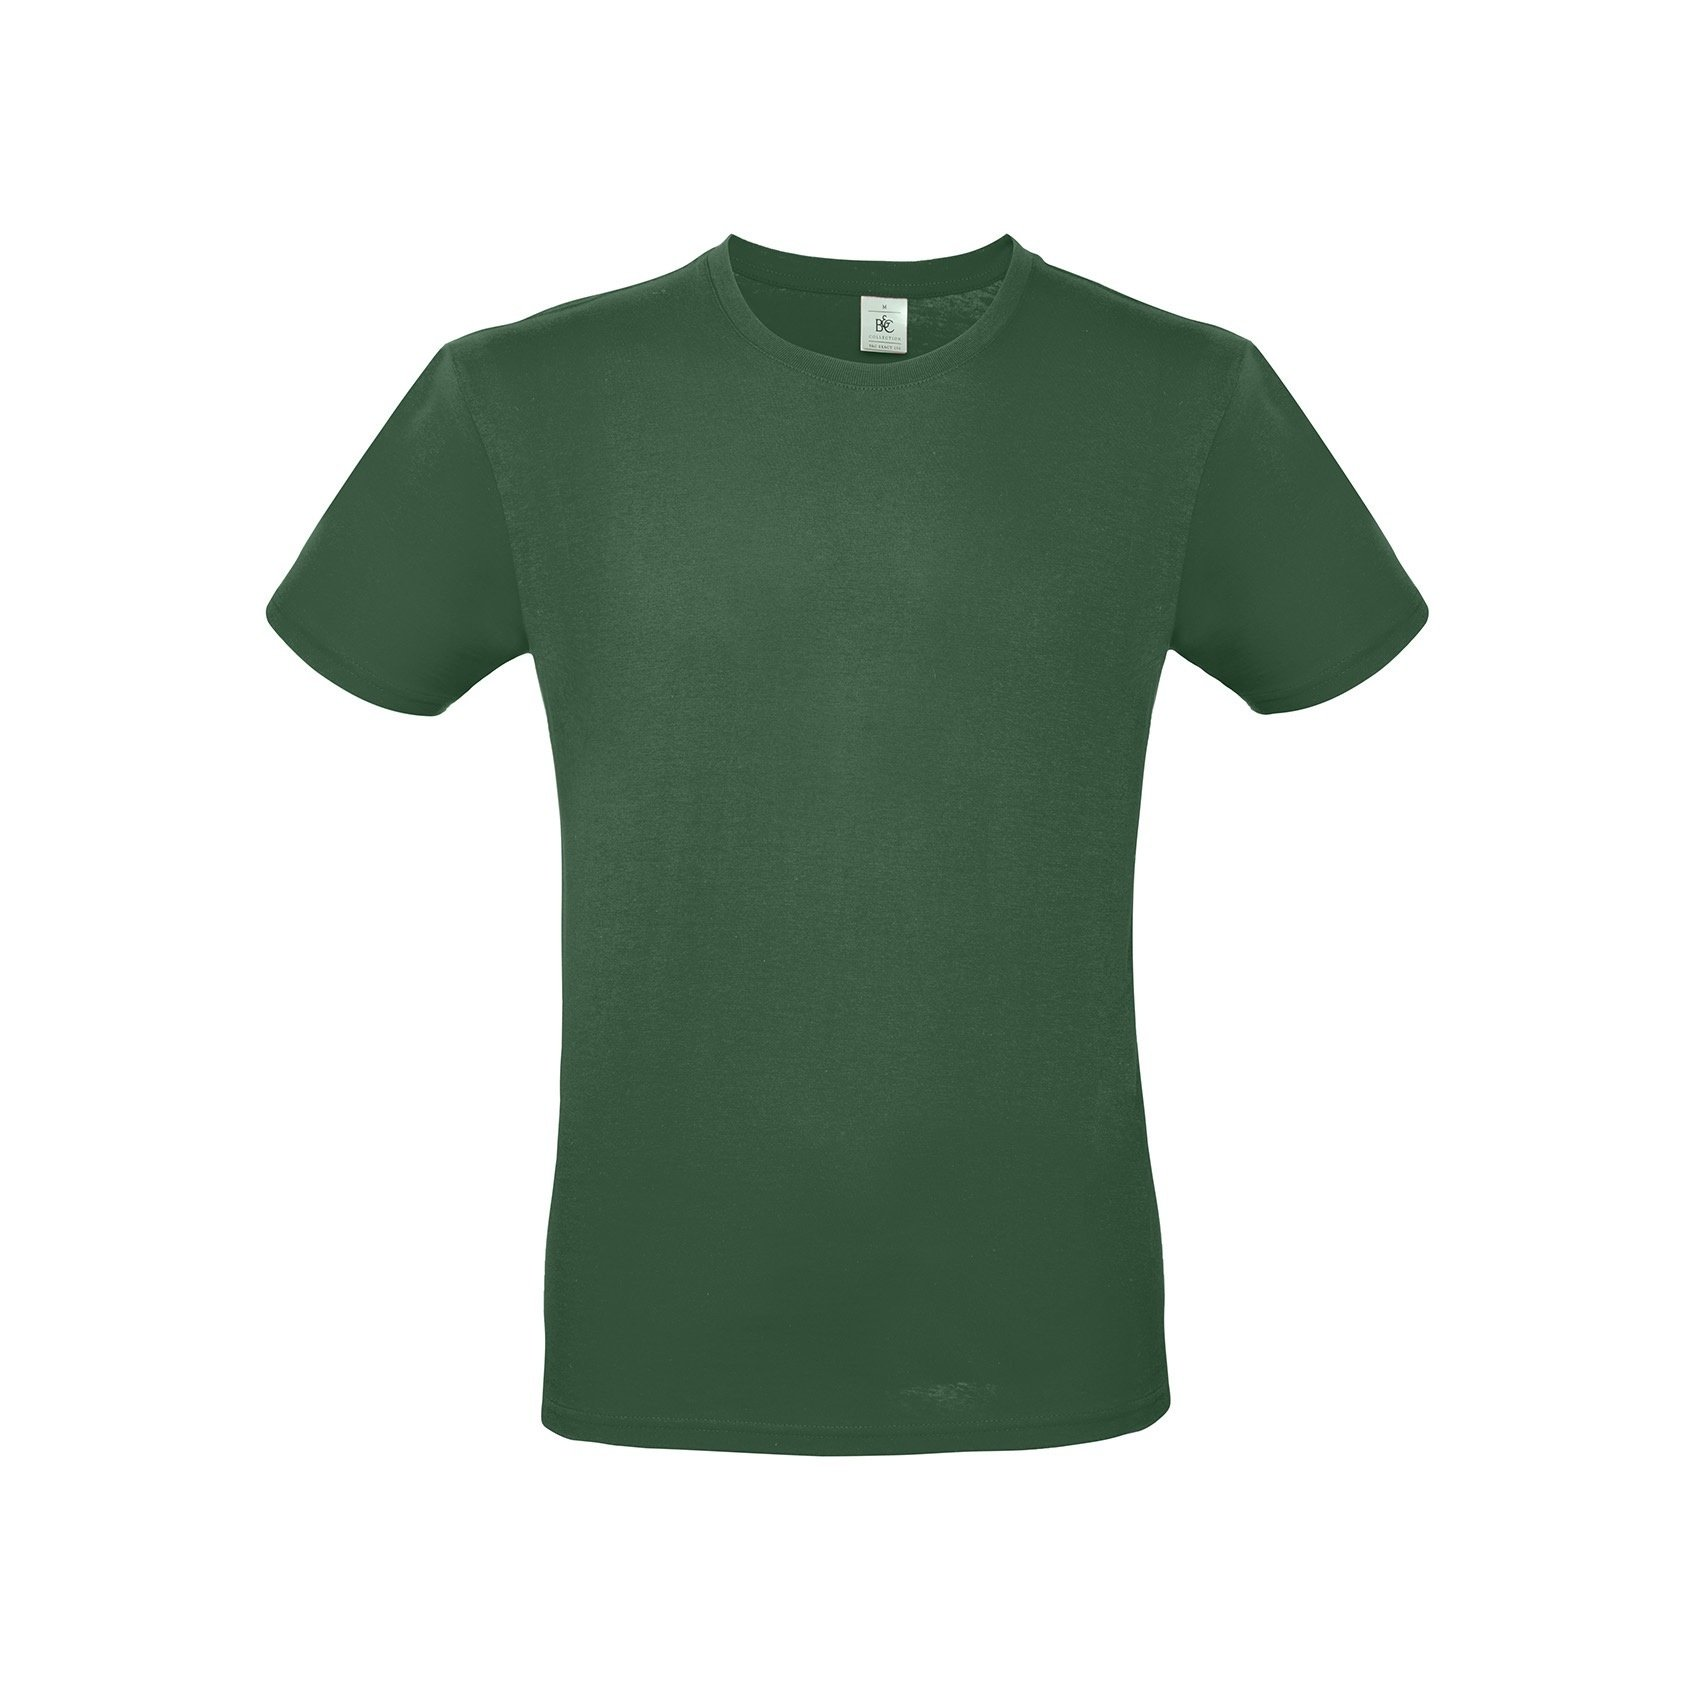 B&C #E150 T-shirt